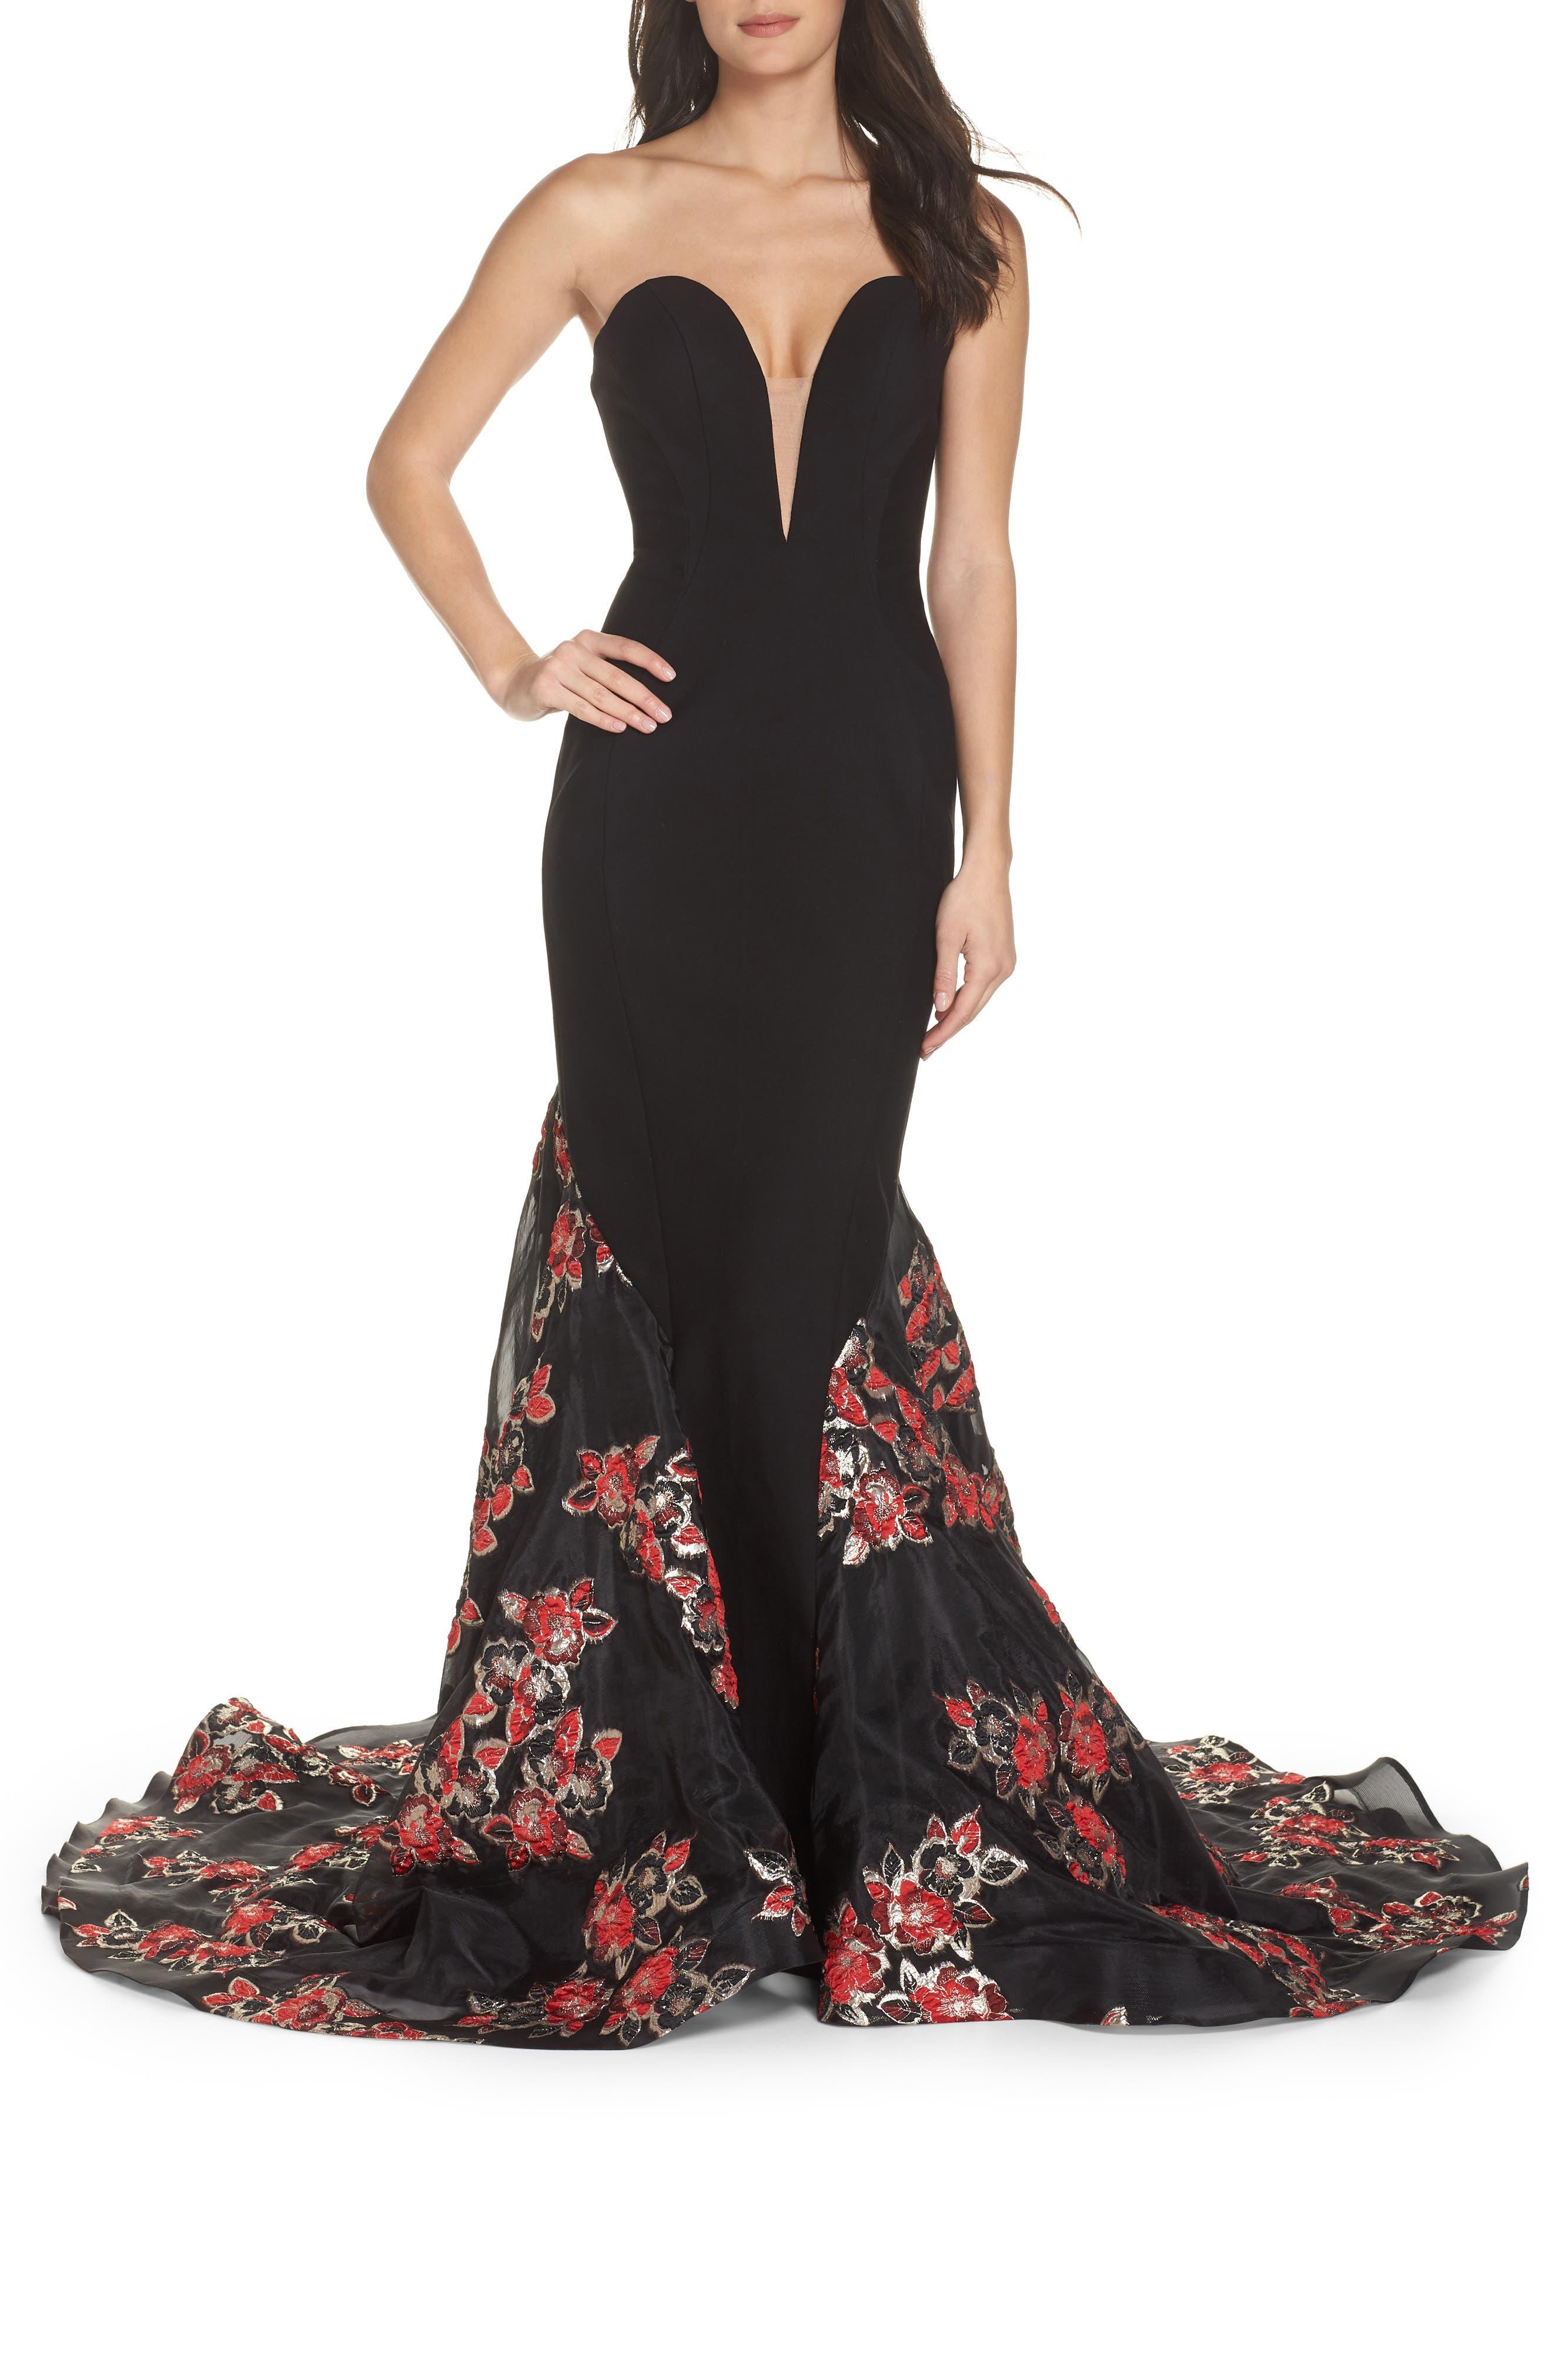 MAC DUGGAL, Plunge Floral Jacquard Mermaid Gown, Main thumbnail 1, color, BLACK